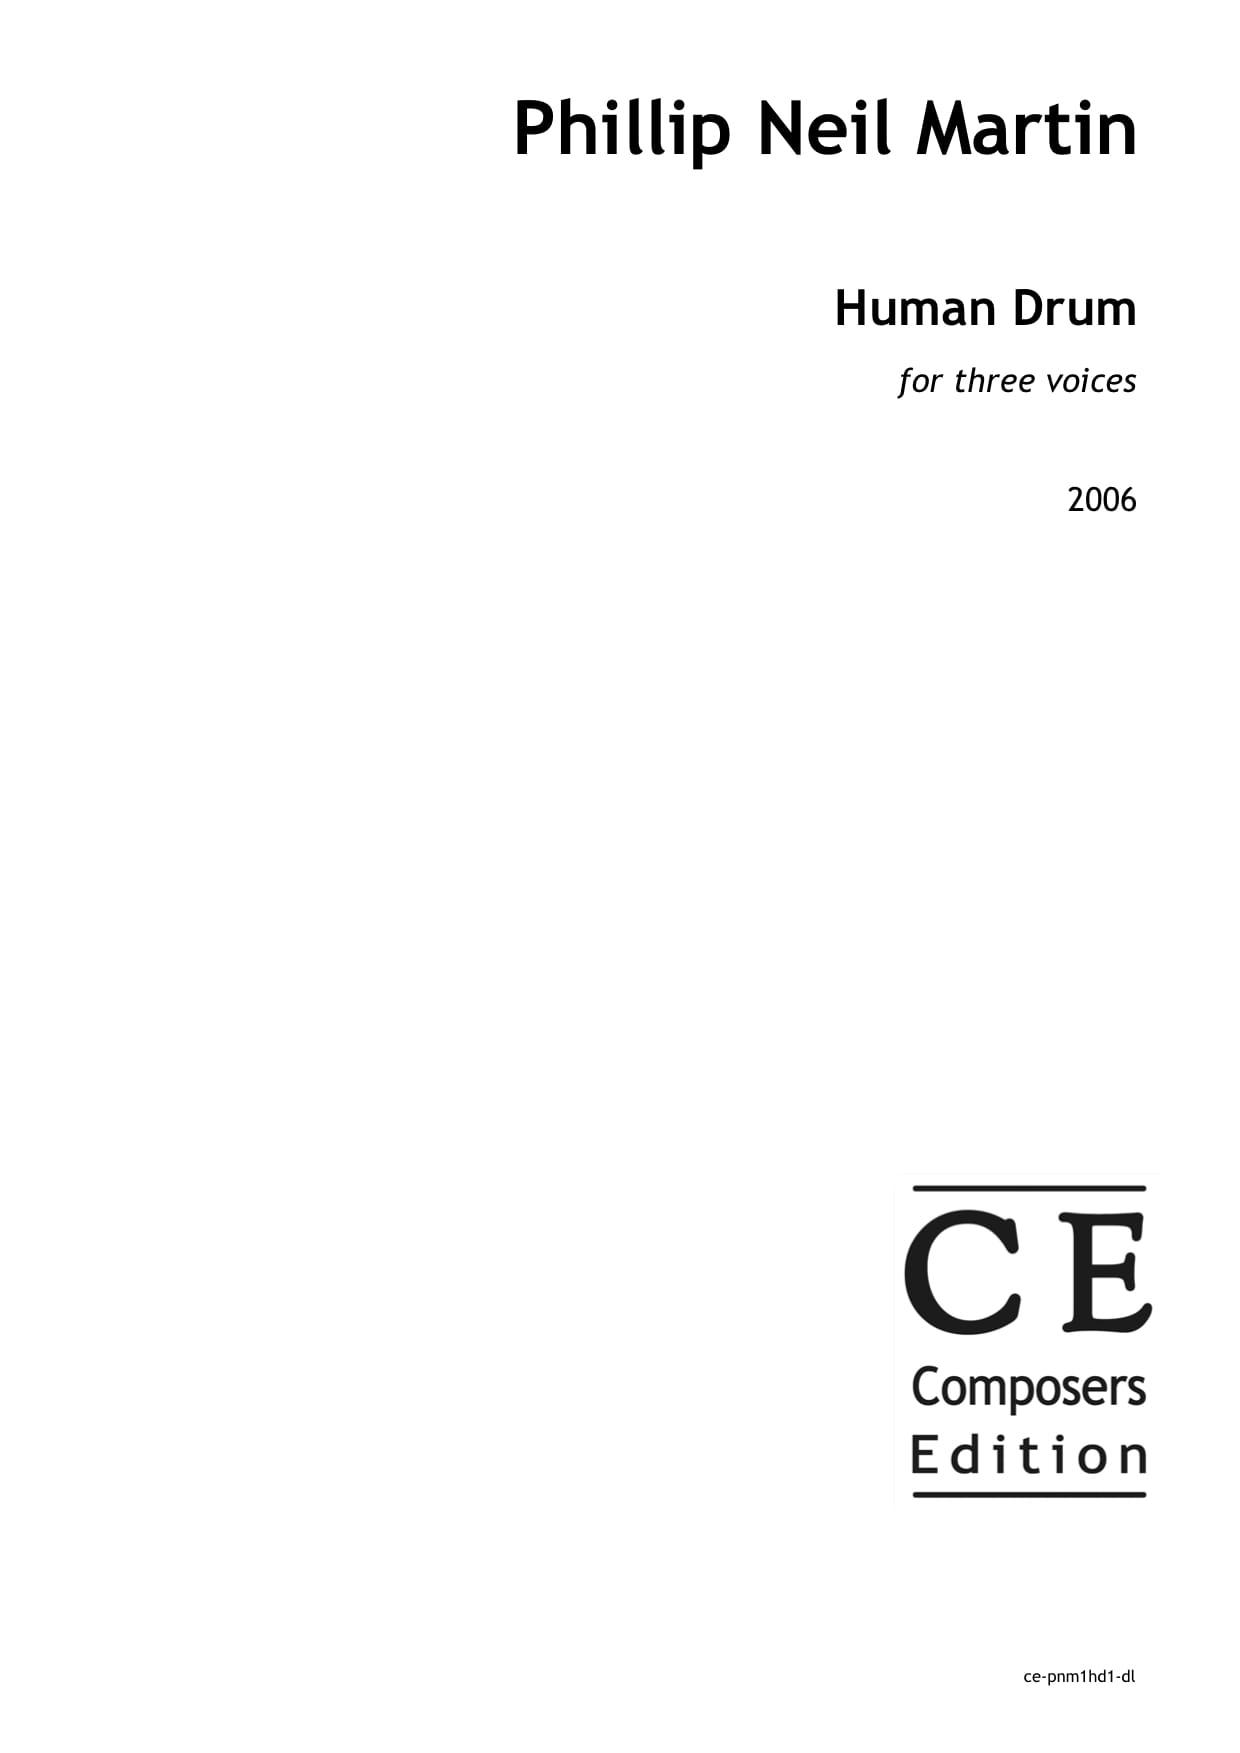 Phillip Neil Martin: Human Drum for three voices